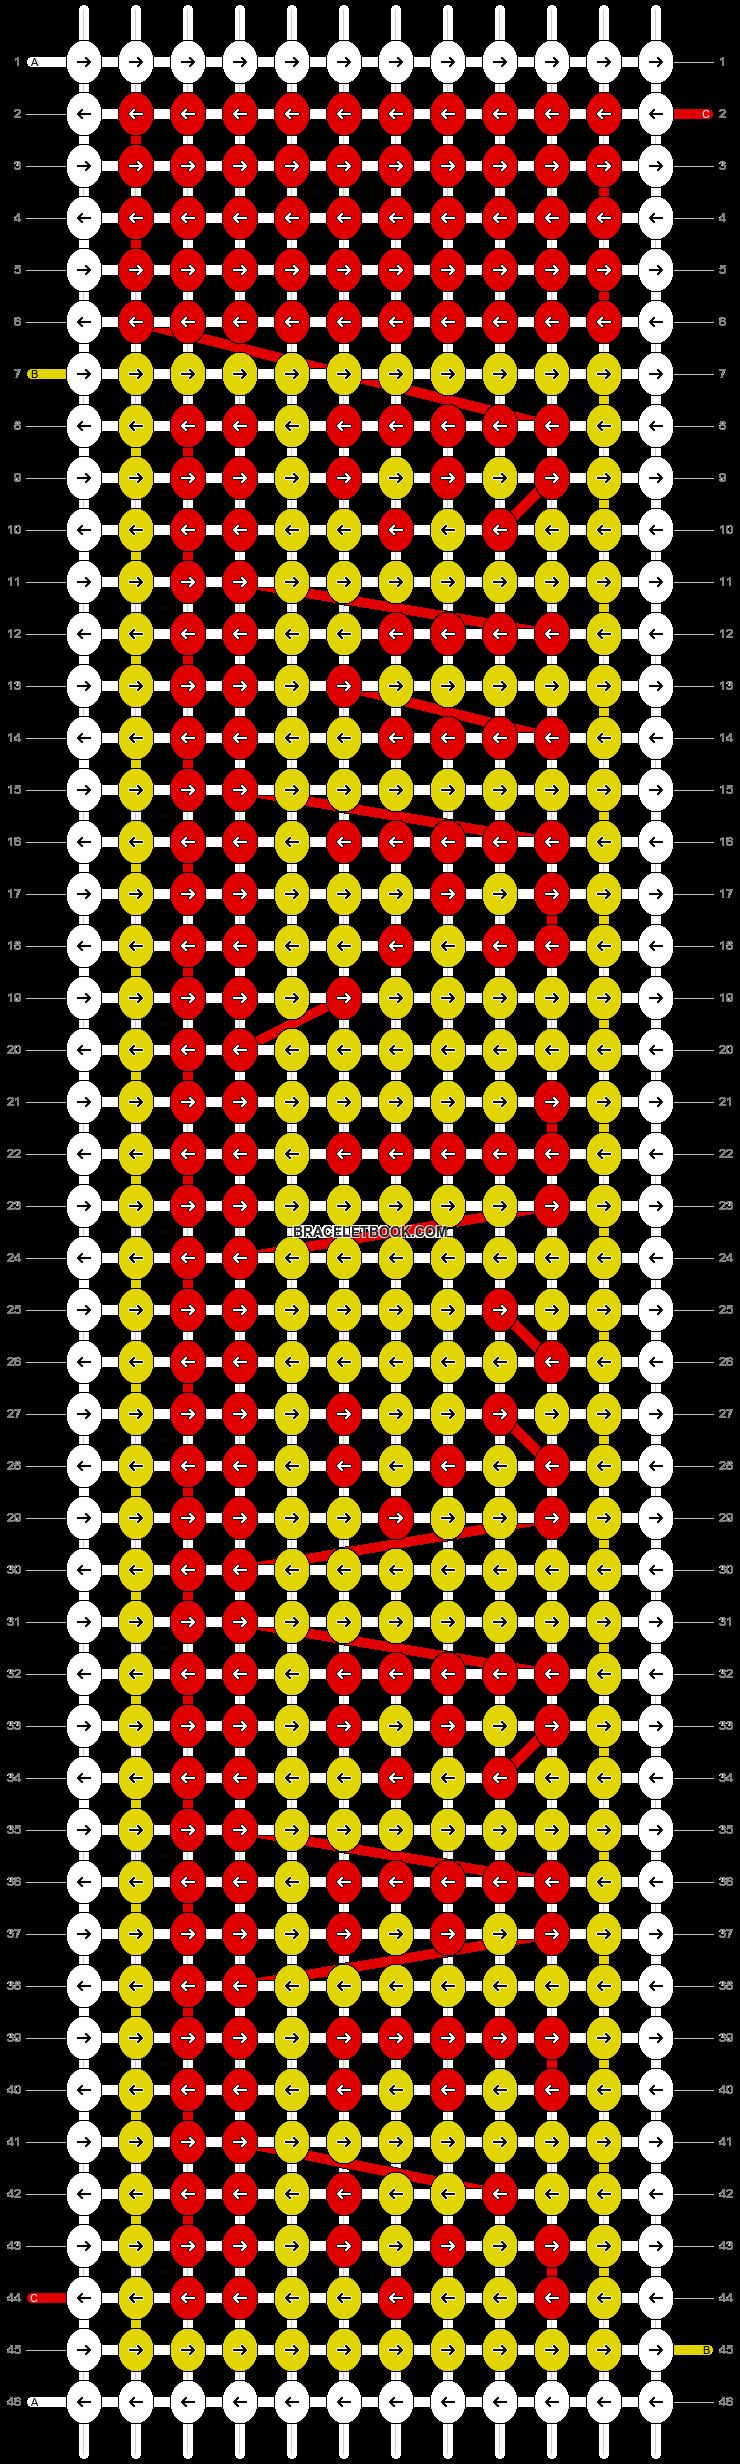 Alpha pattern #44350 pattern